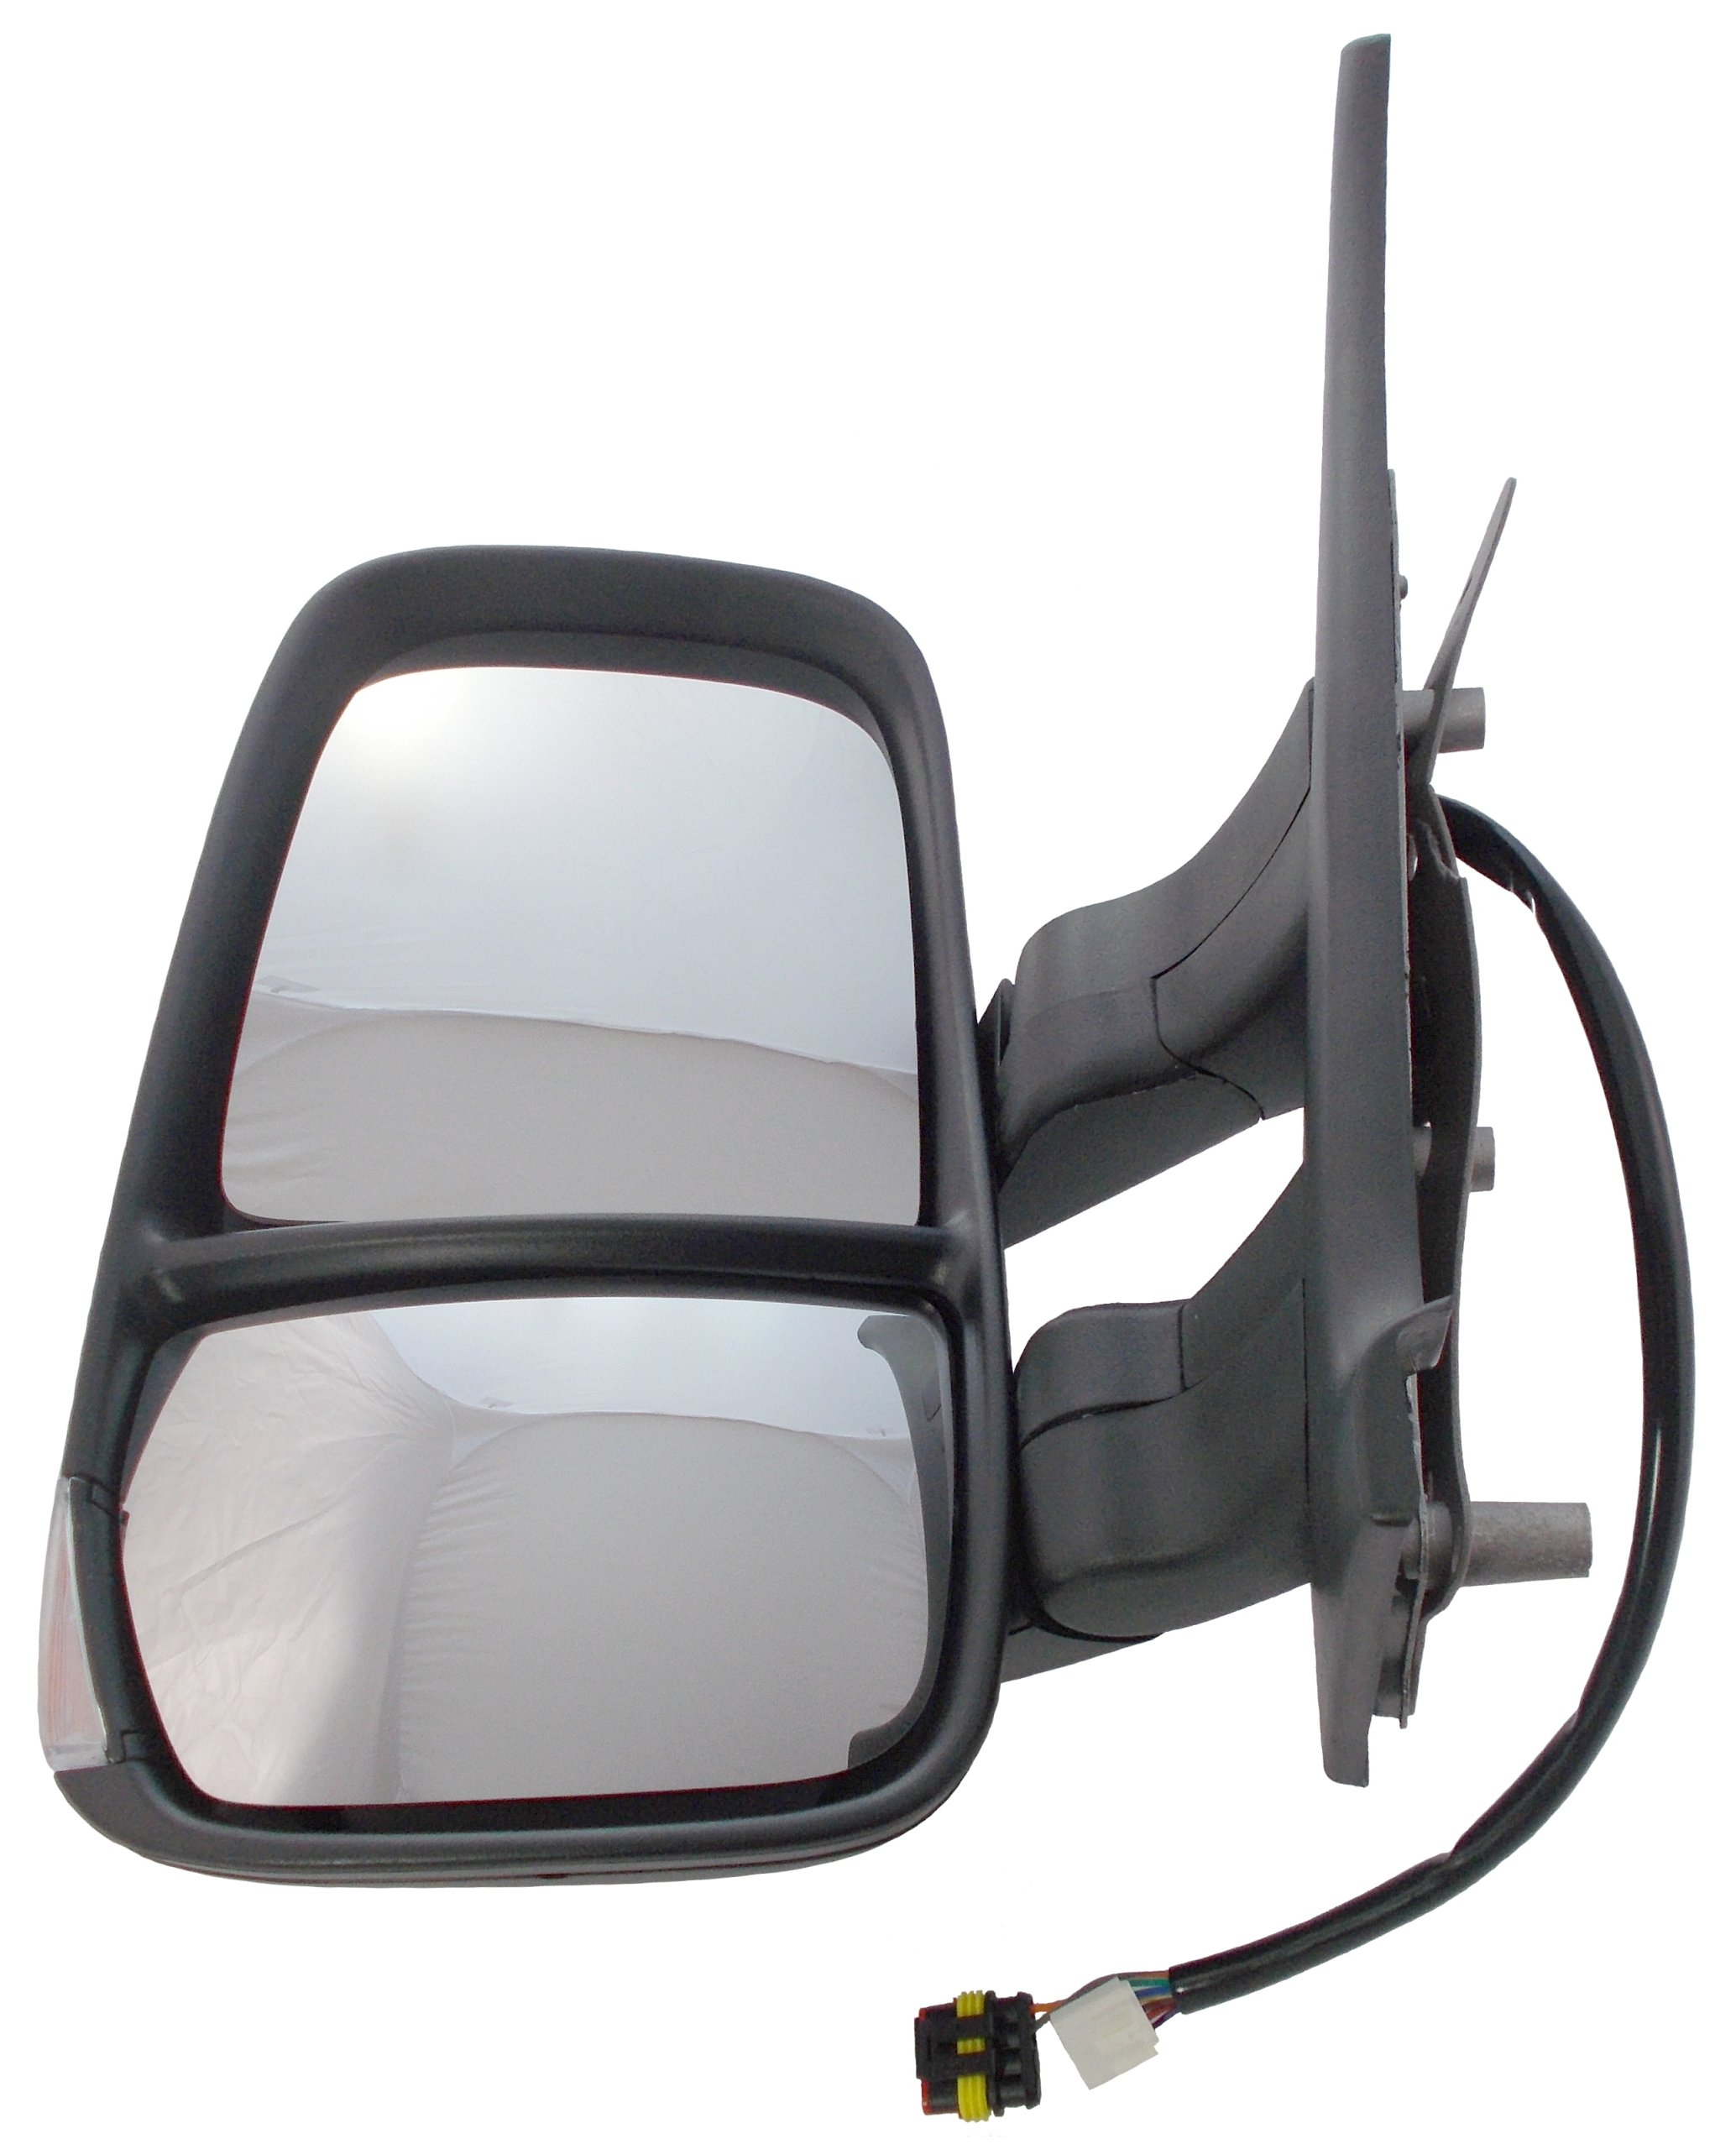 зеркало конт короткие iveco daily 2006-2014r l